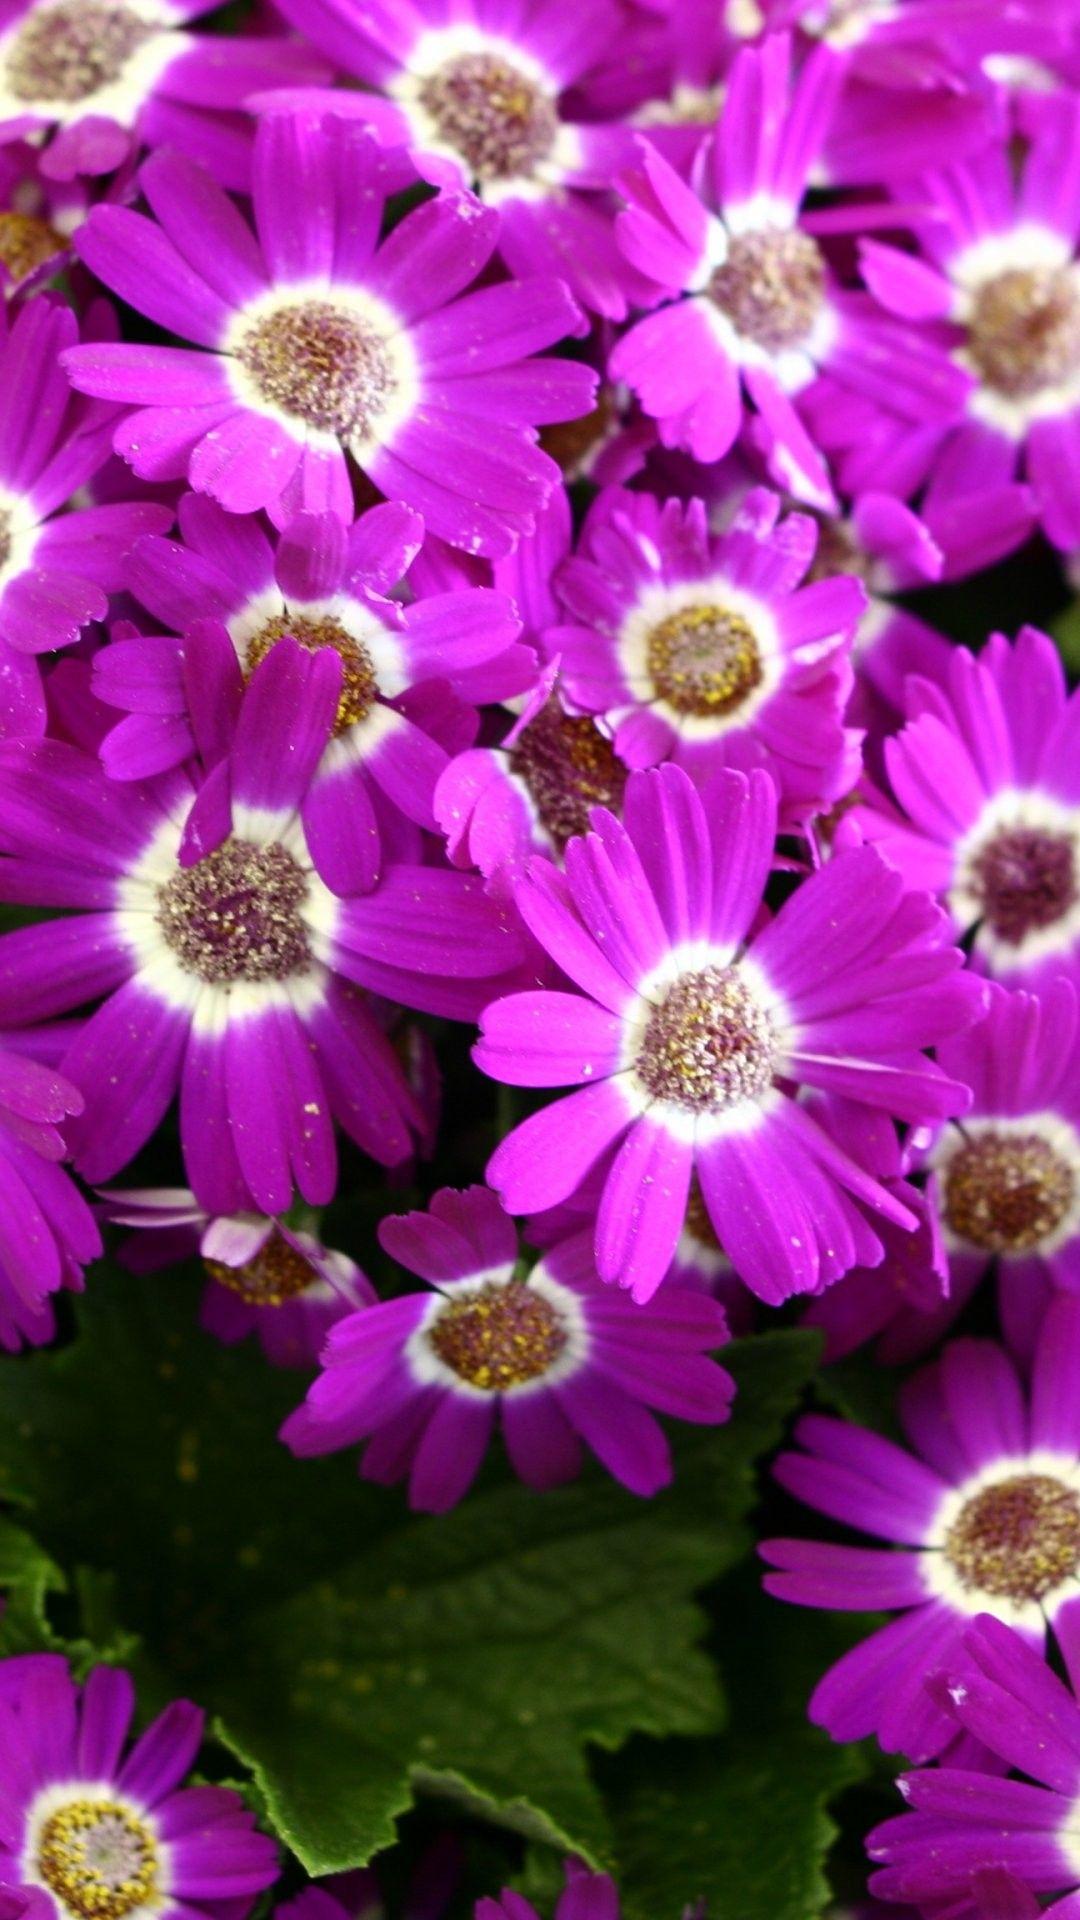 Iphone 6 wallpaper tumblr flower - Spring Flowers Iphone 6 Plus Wallpaper 14129 Flowers Iphone 6 Plus Wallpapers